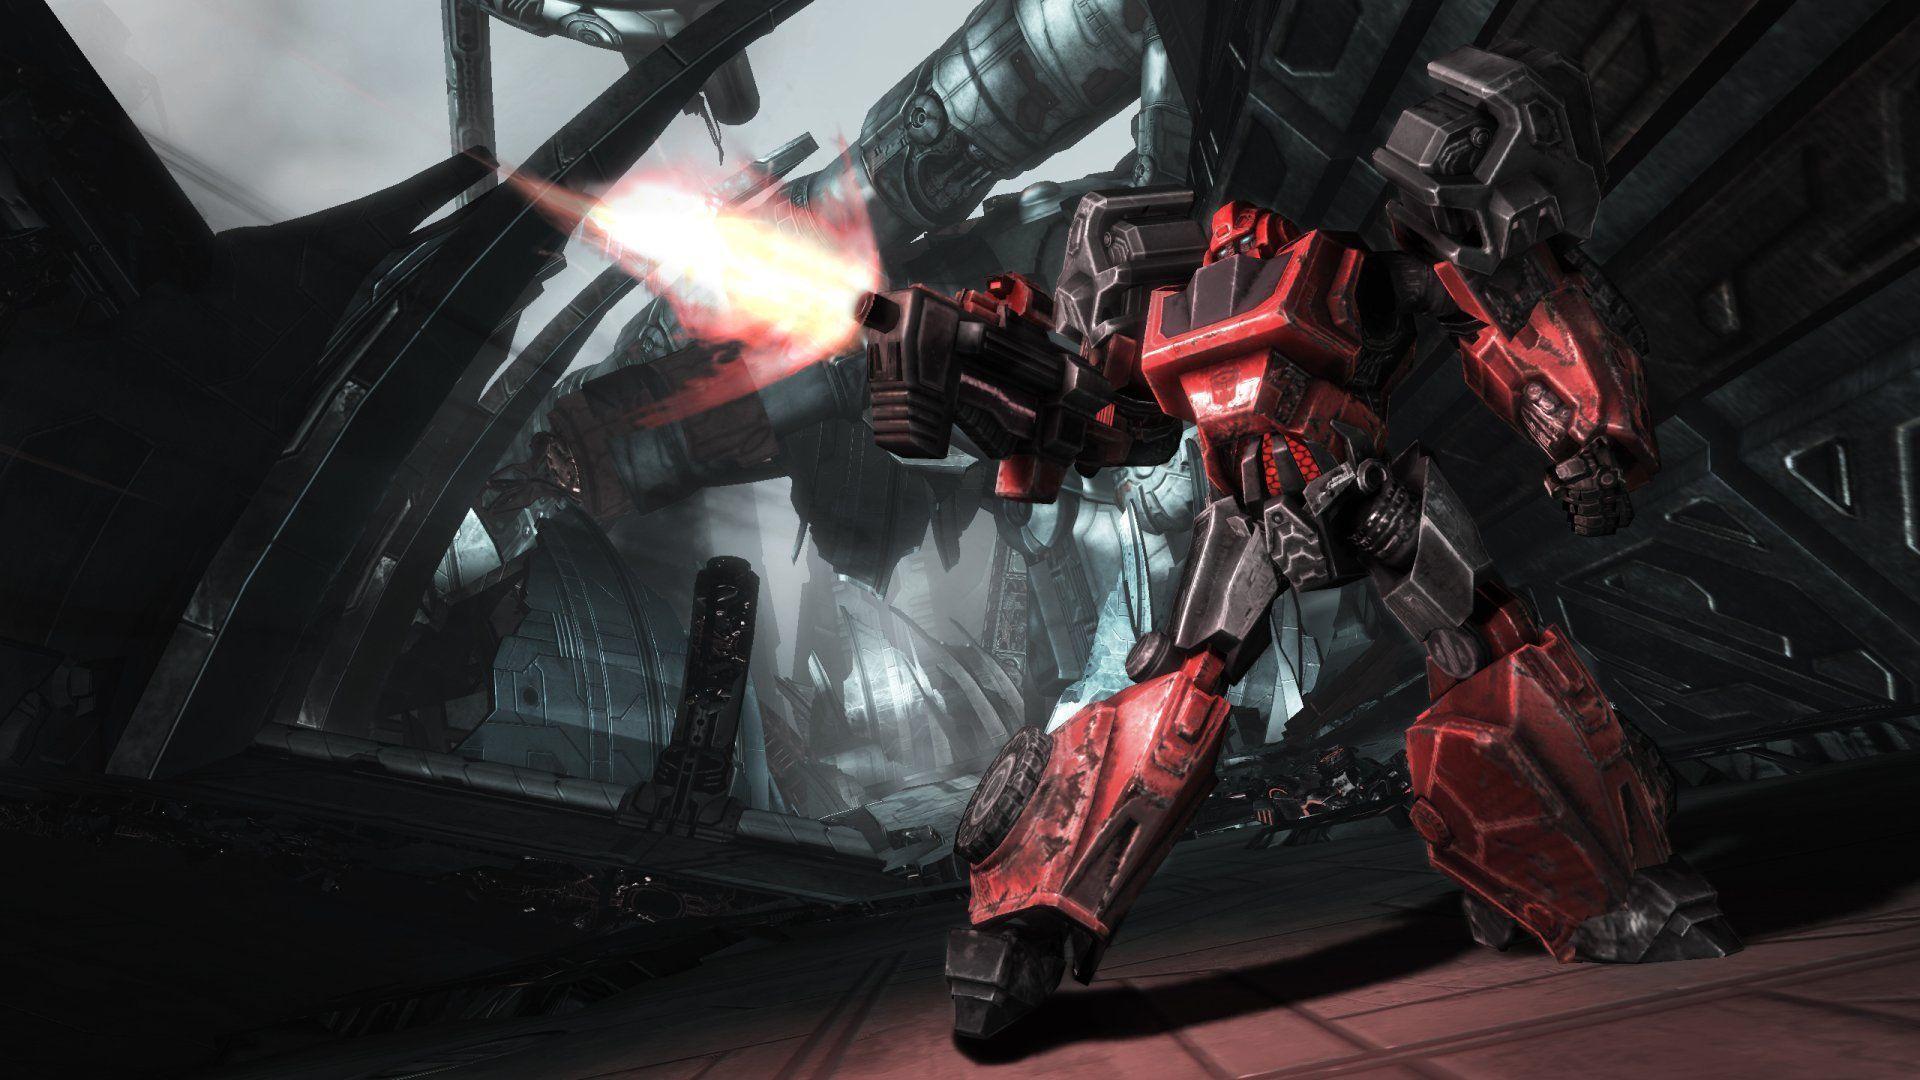 Fall Of Cybertron Wallpaper Transformers Cybertron Wallpapers Wallpaper Cave